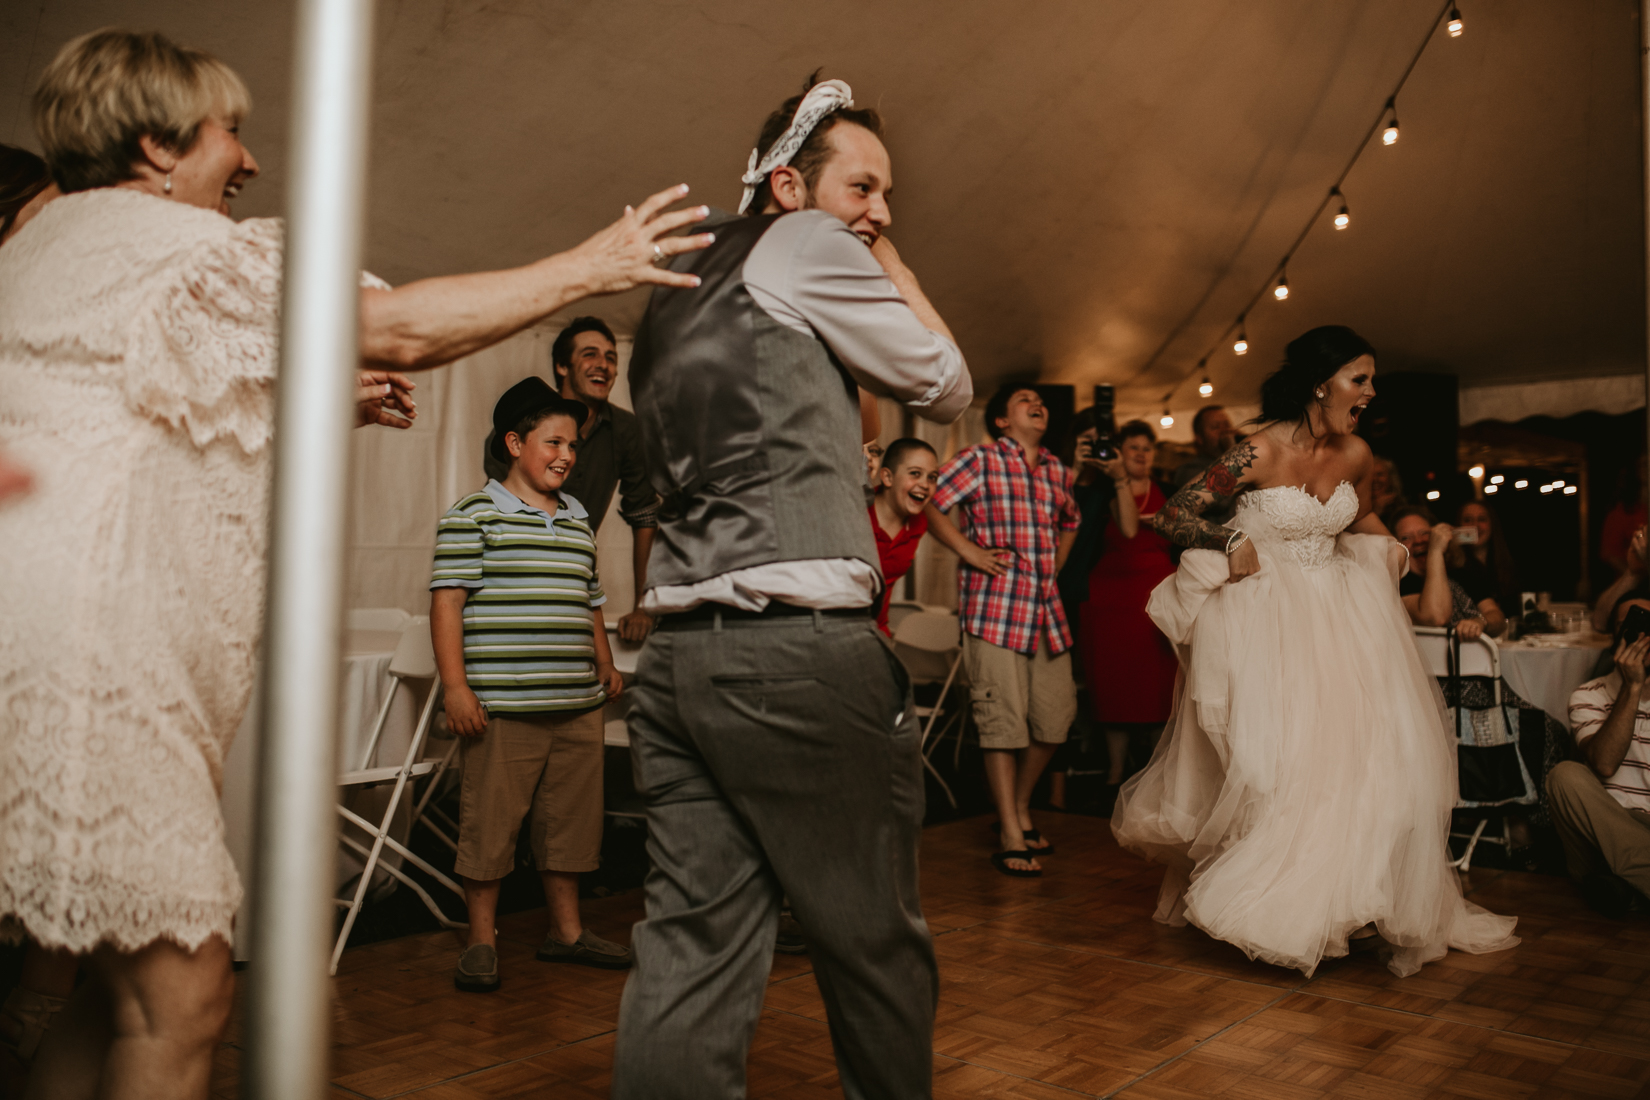 olivia_zay_wedding_09_2018-9108.jpg